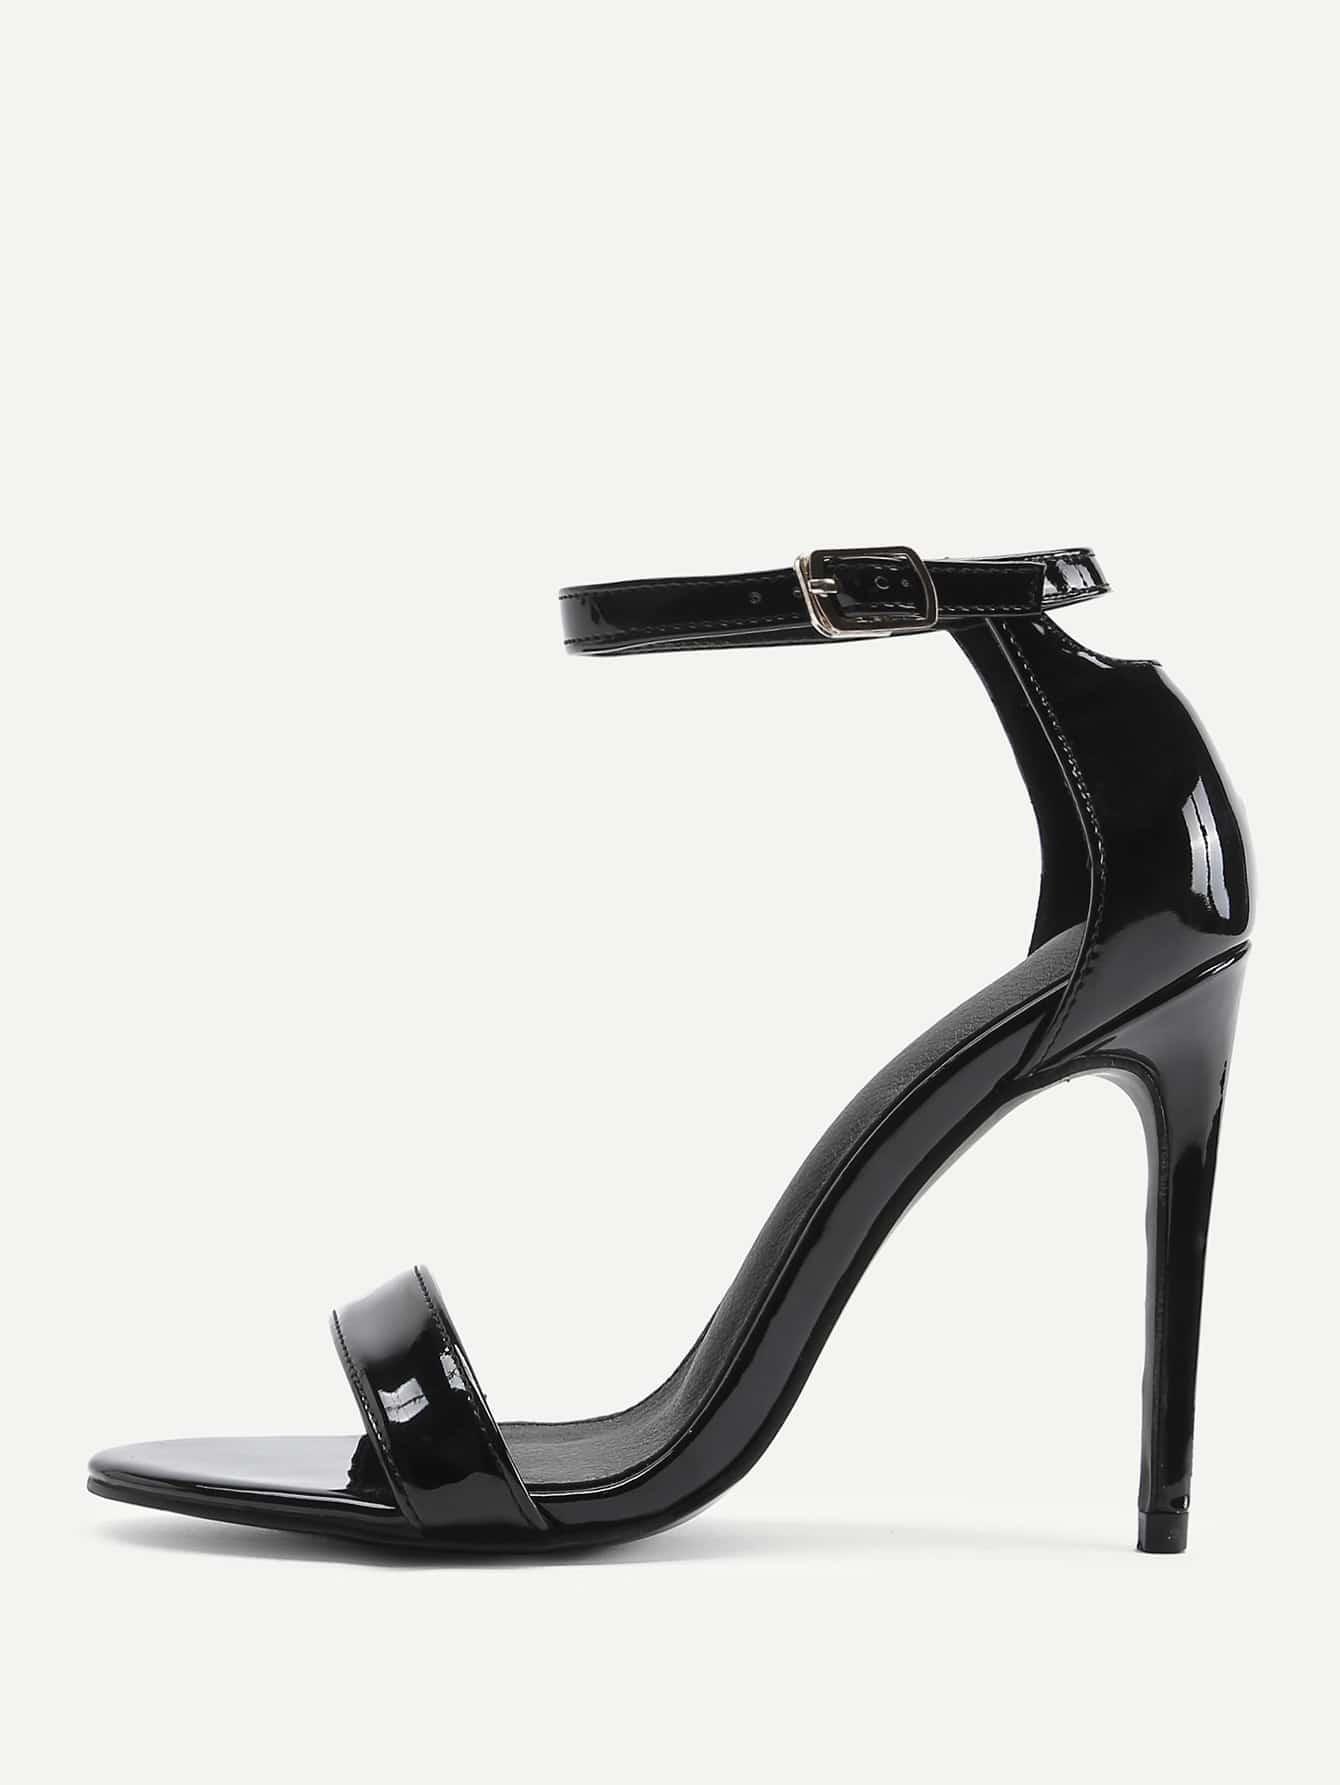 Peep Toe Ankle Strap Stiletto Heels